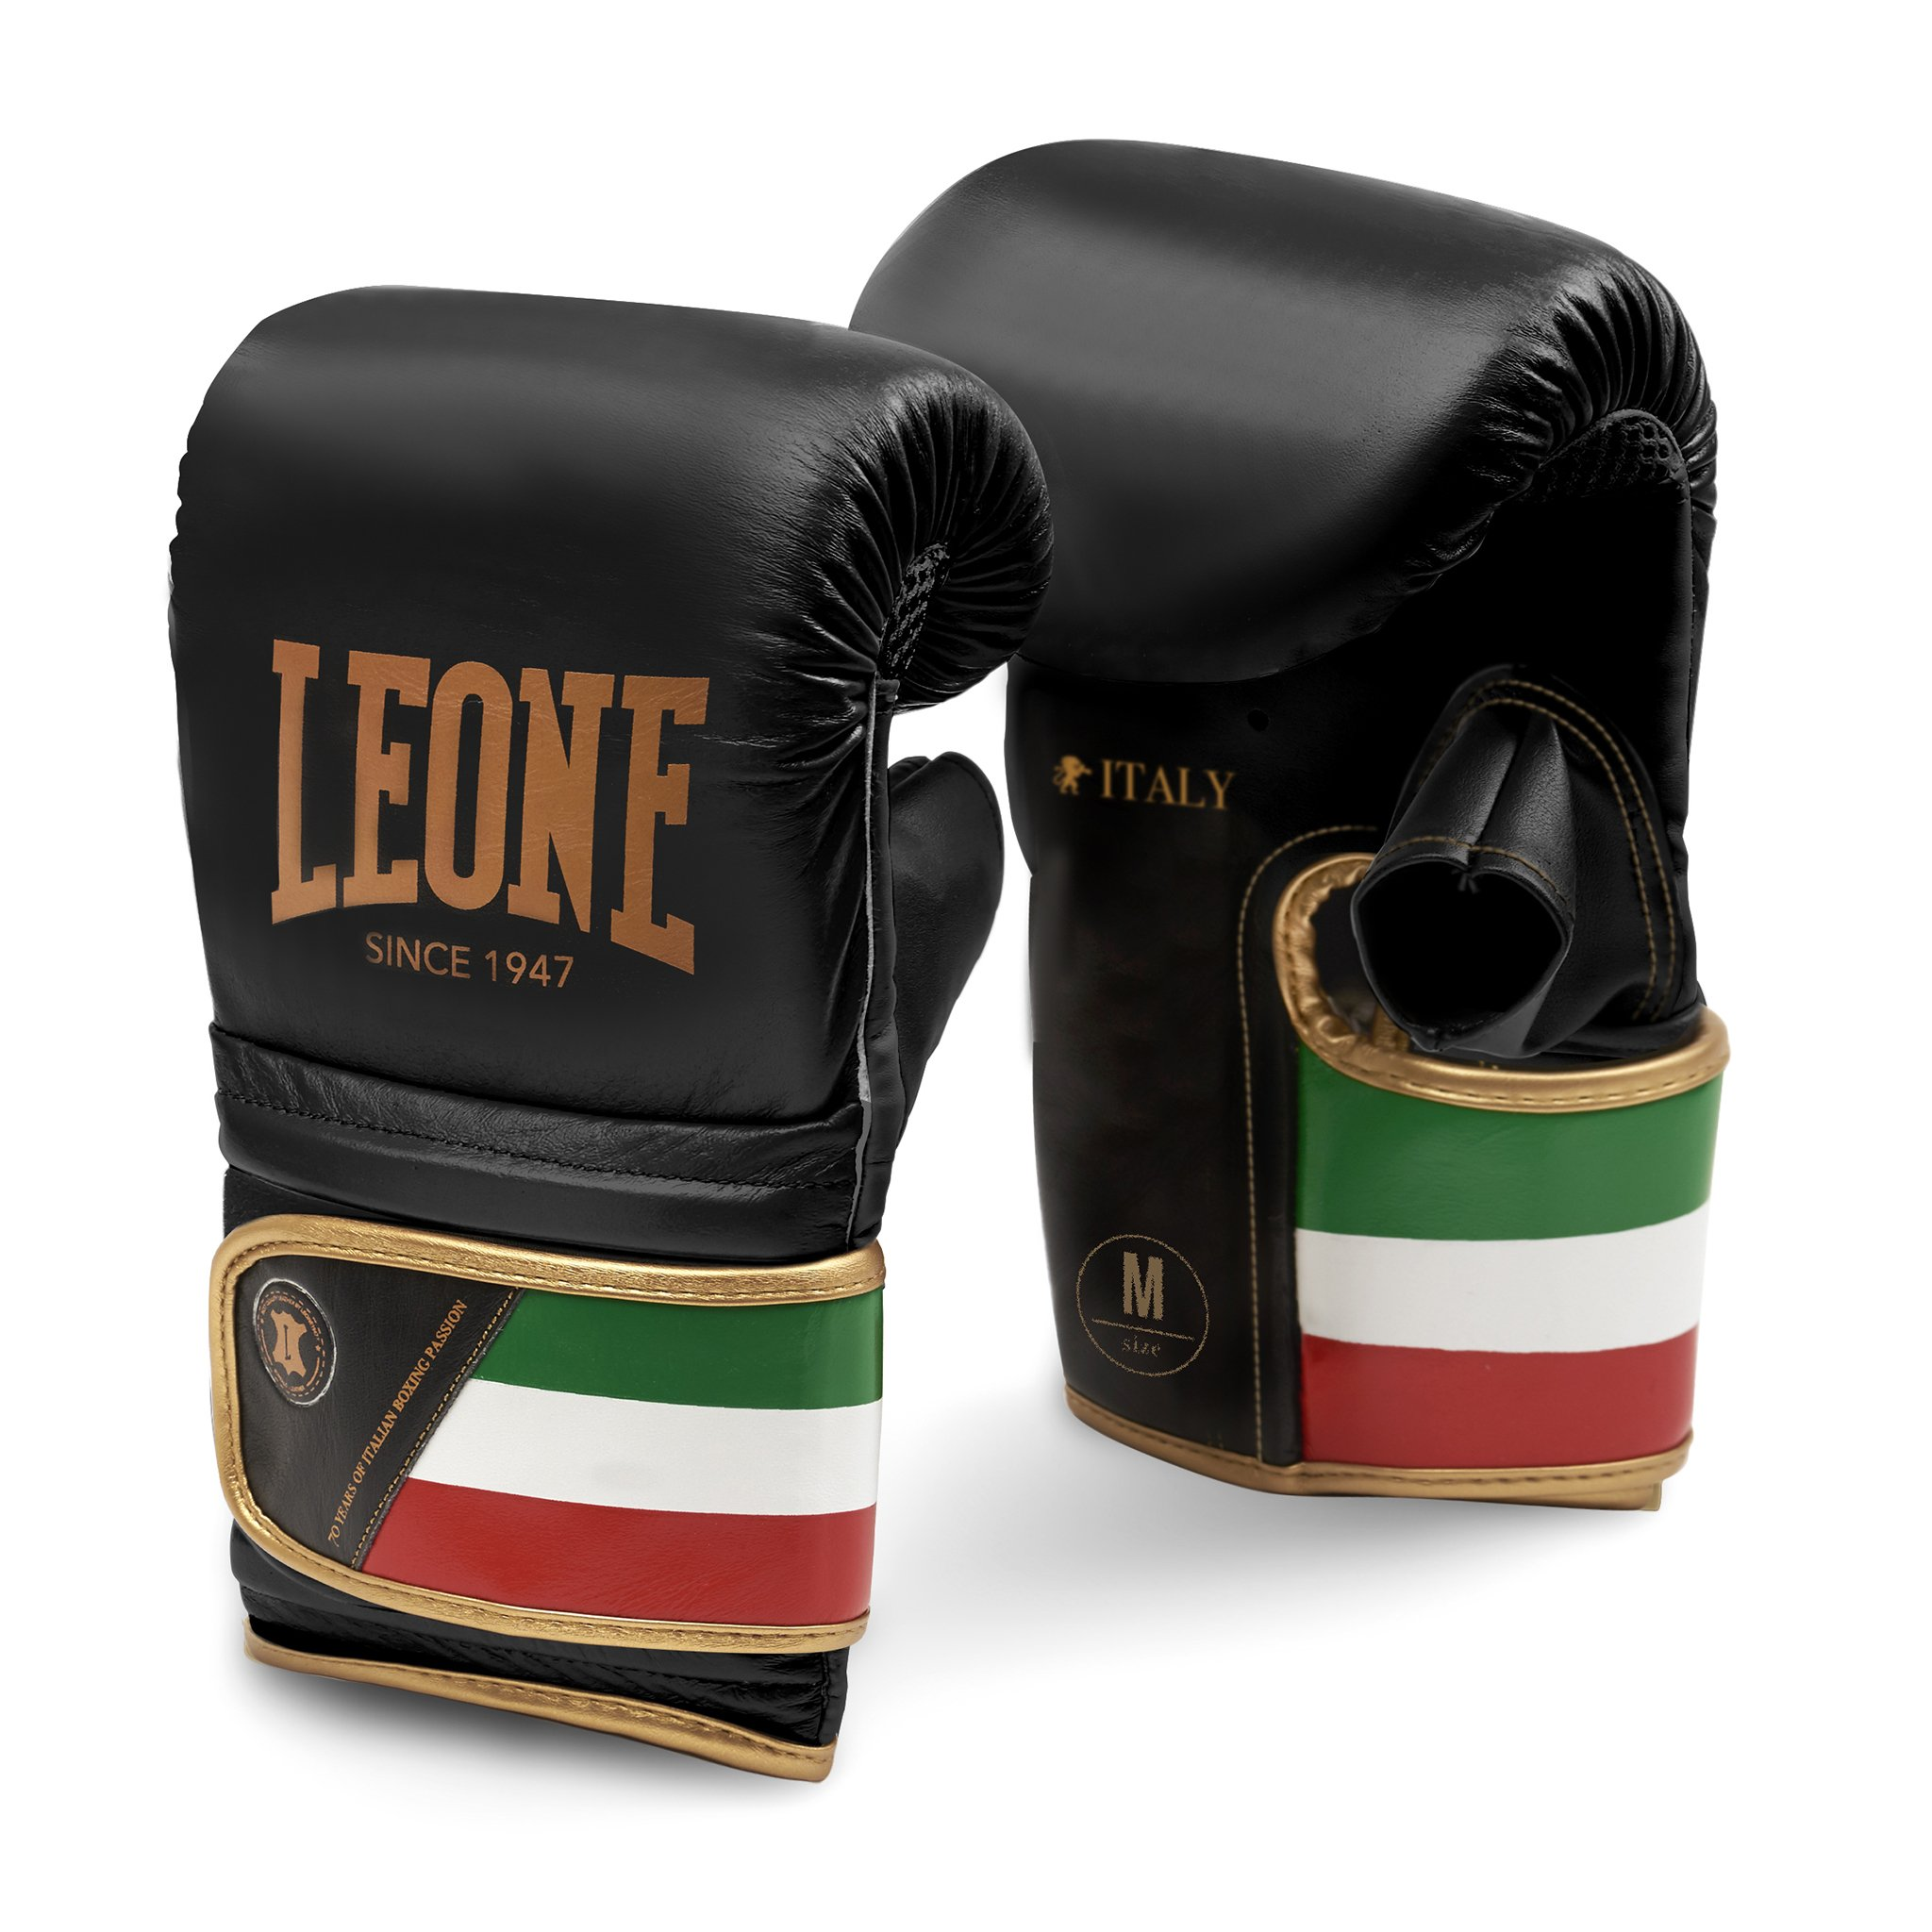 Leone GS090 Italy Bag Gloves (Black, S)